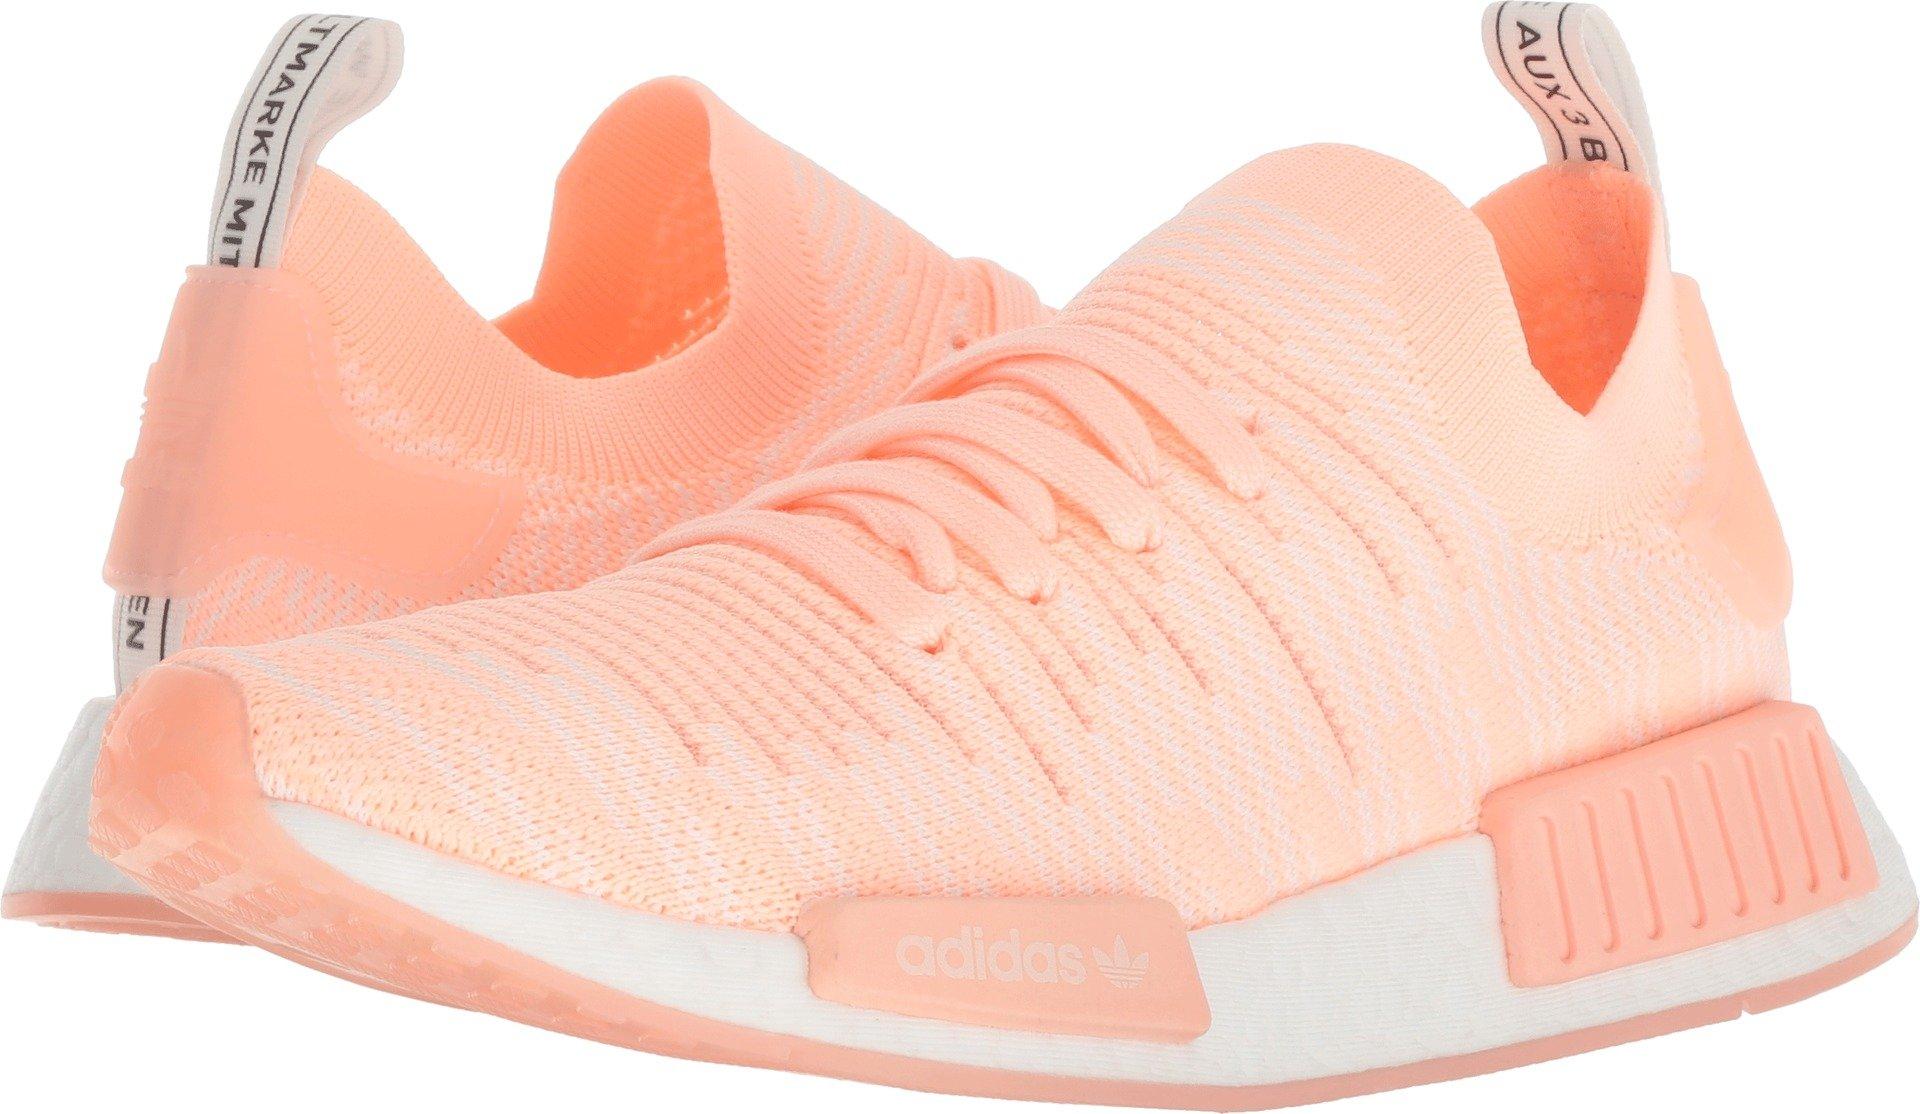 info for 0956c b0f67 Galleon - Adidas Originals Women s NMD R1 Pink Clear Orange Clear Orange Cloud  White 10 B US